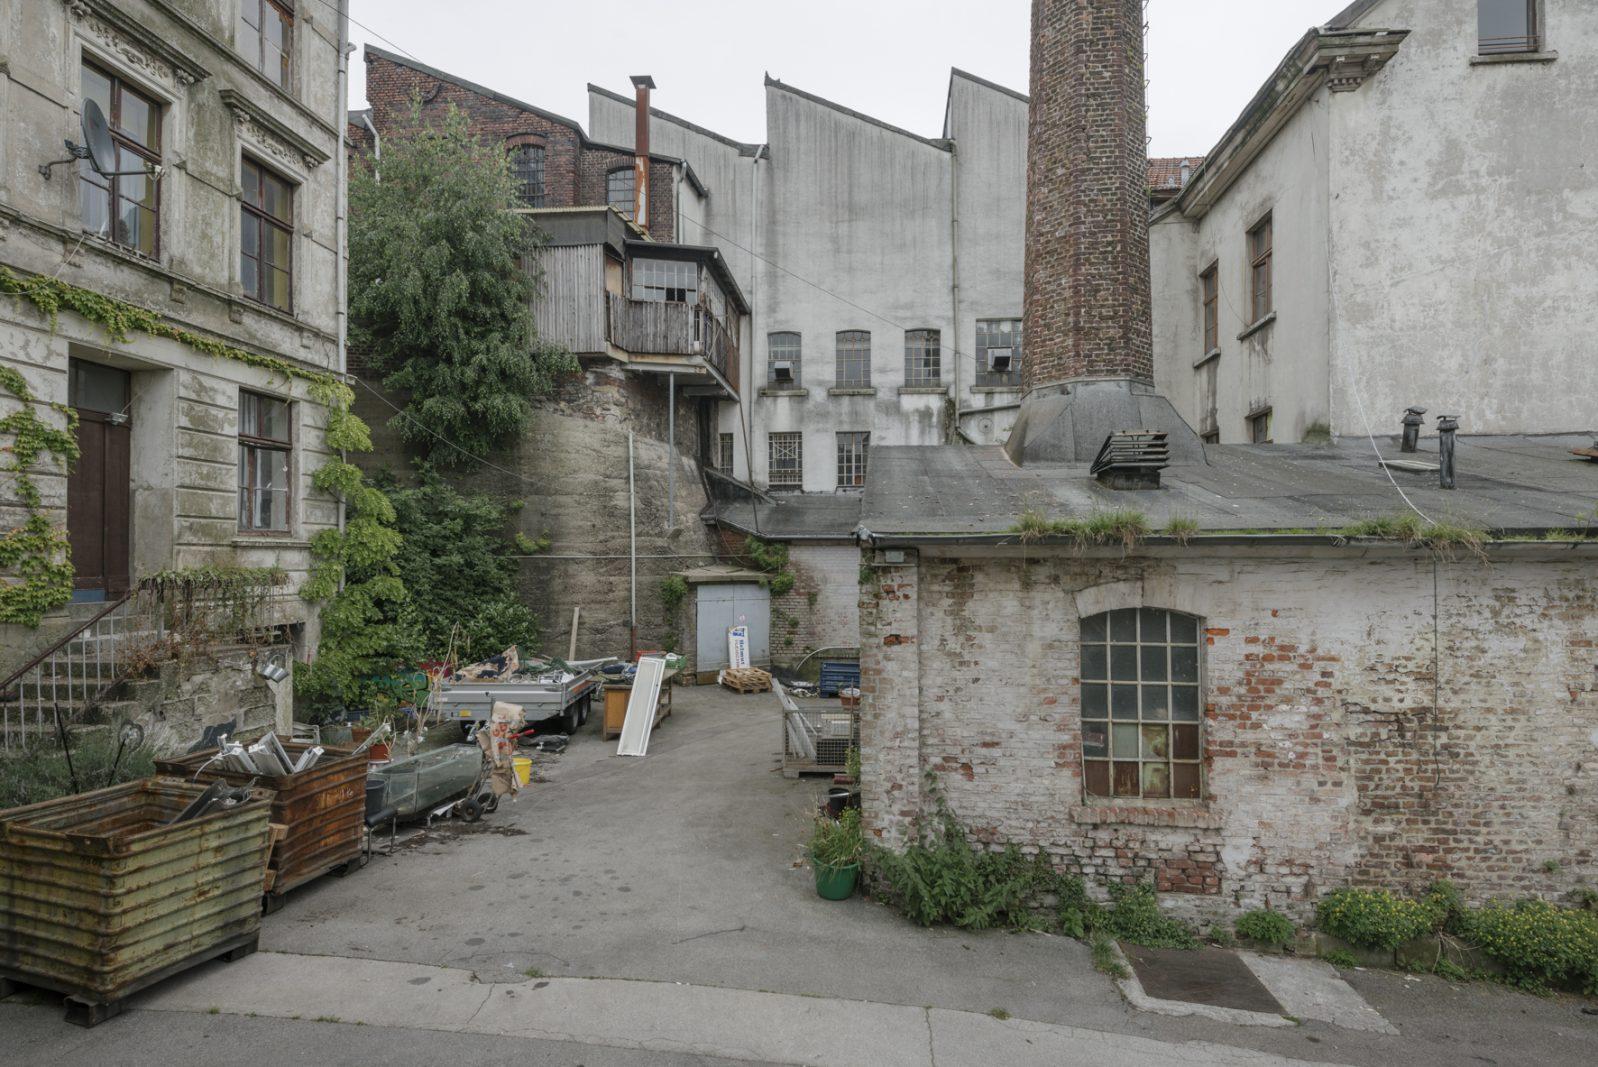 Foto: Jann Höfer, (c) Urbane Nachbarschaft BOB gGmbH